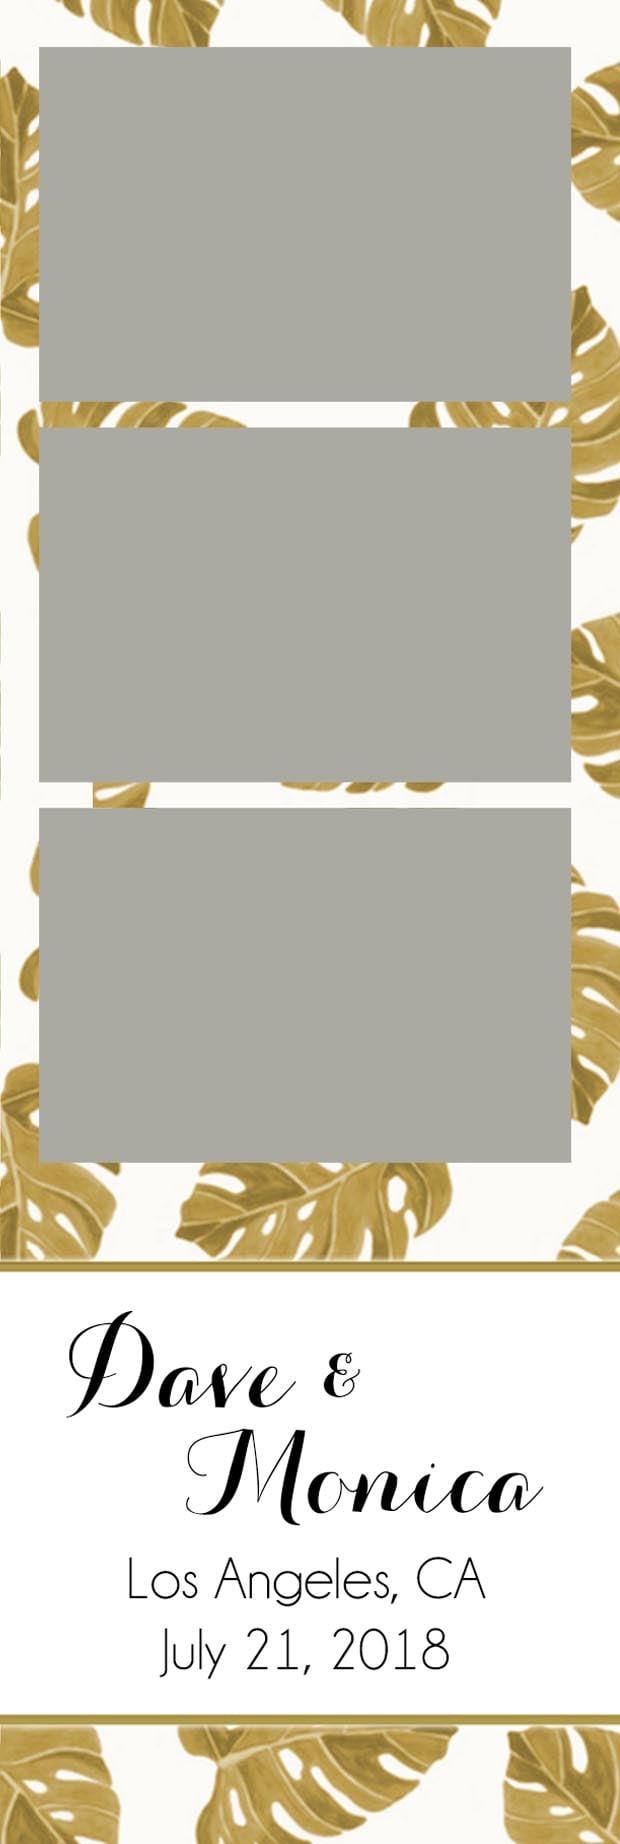 Gold Leaves-min